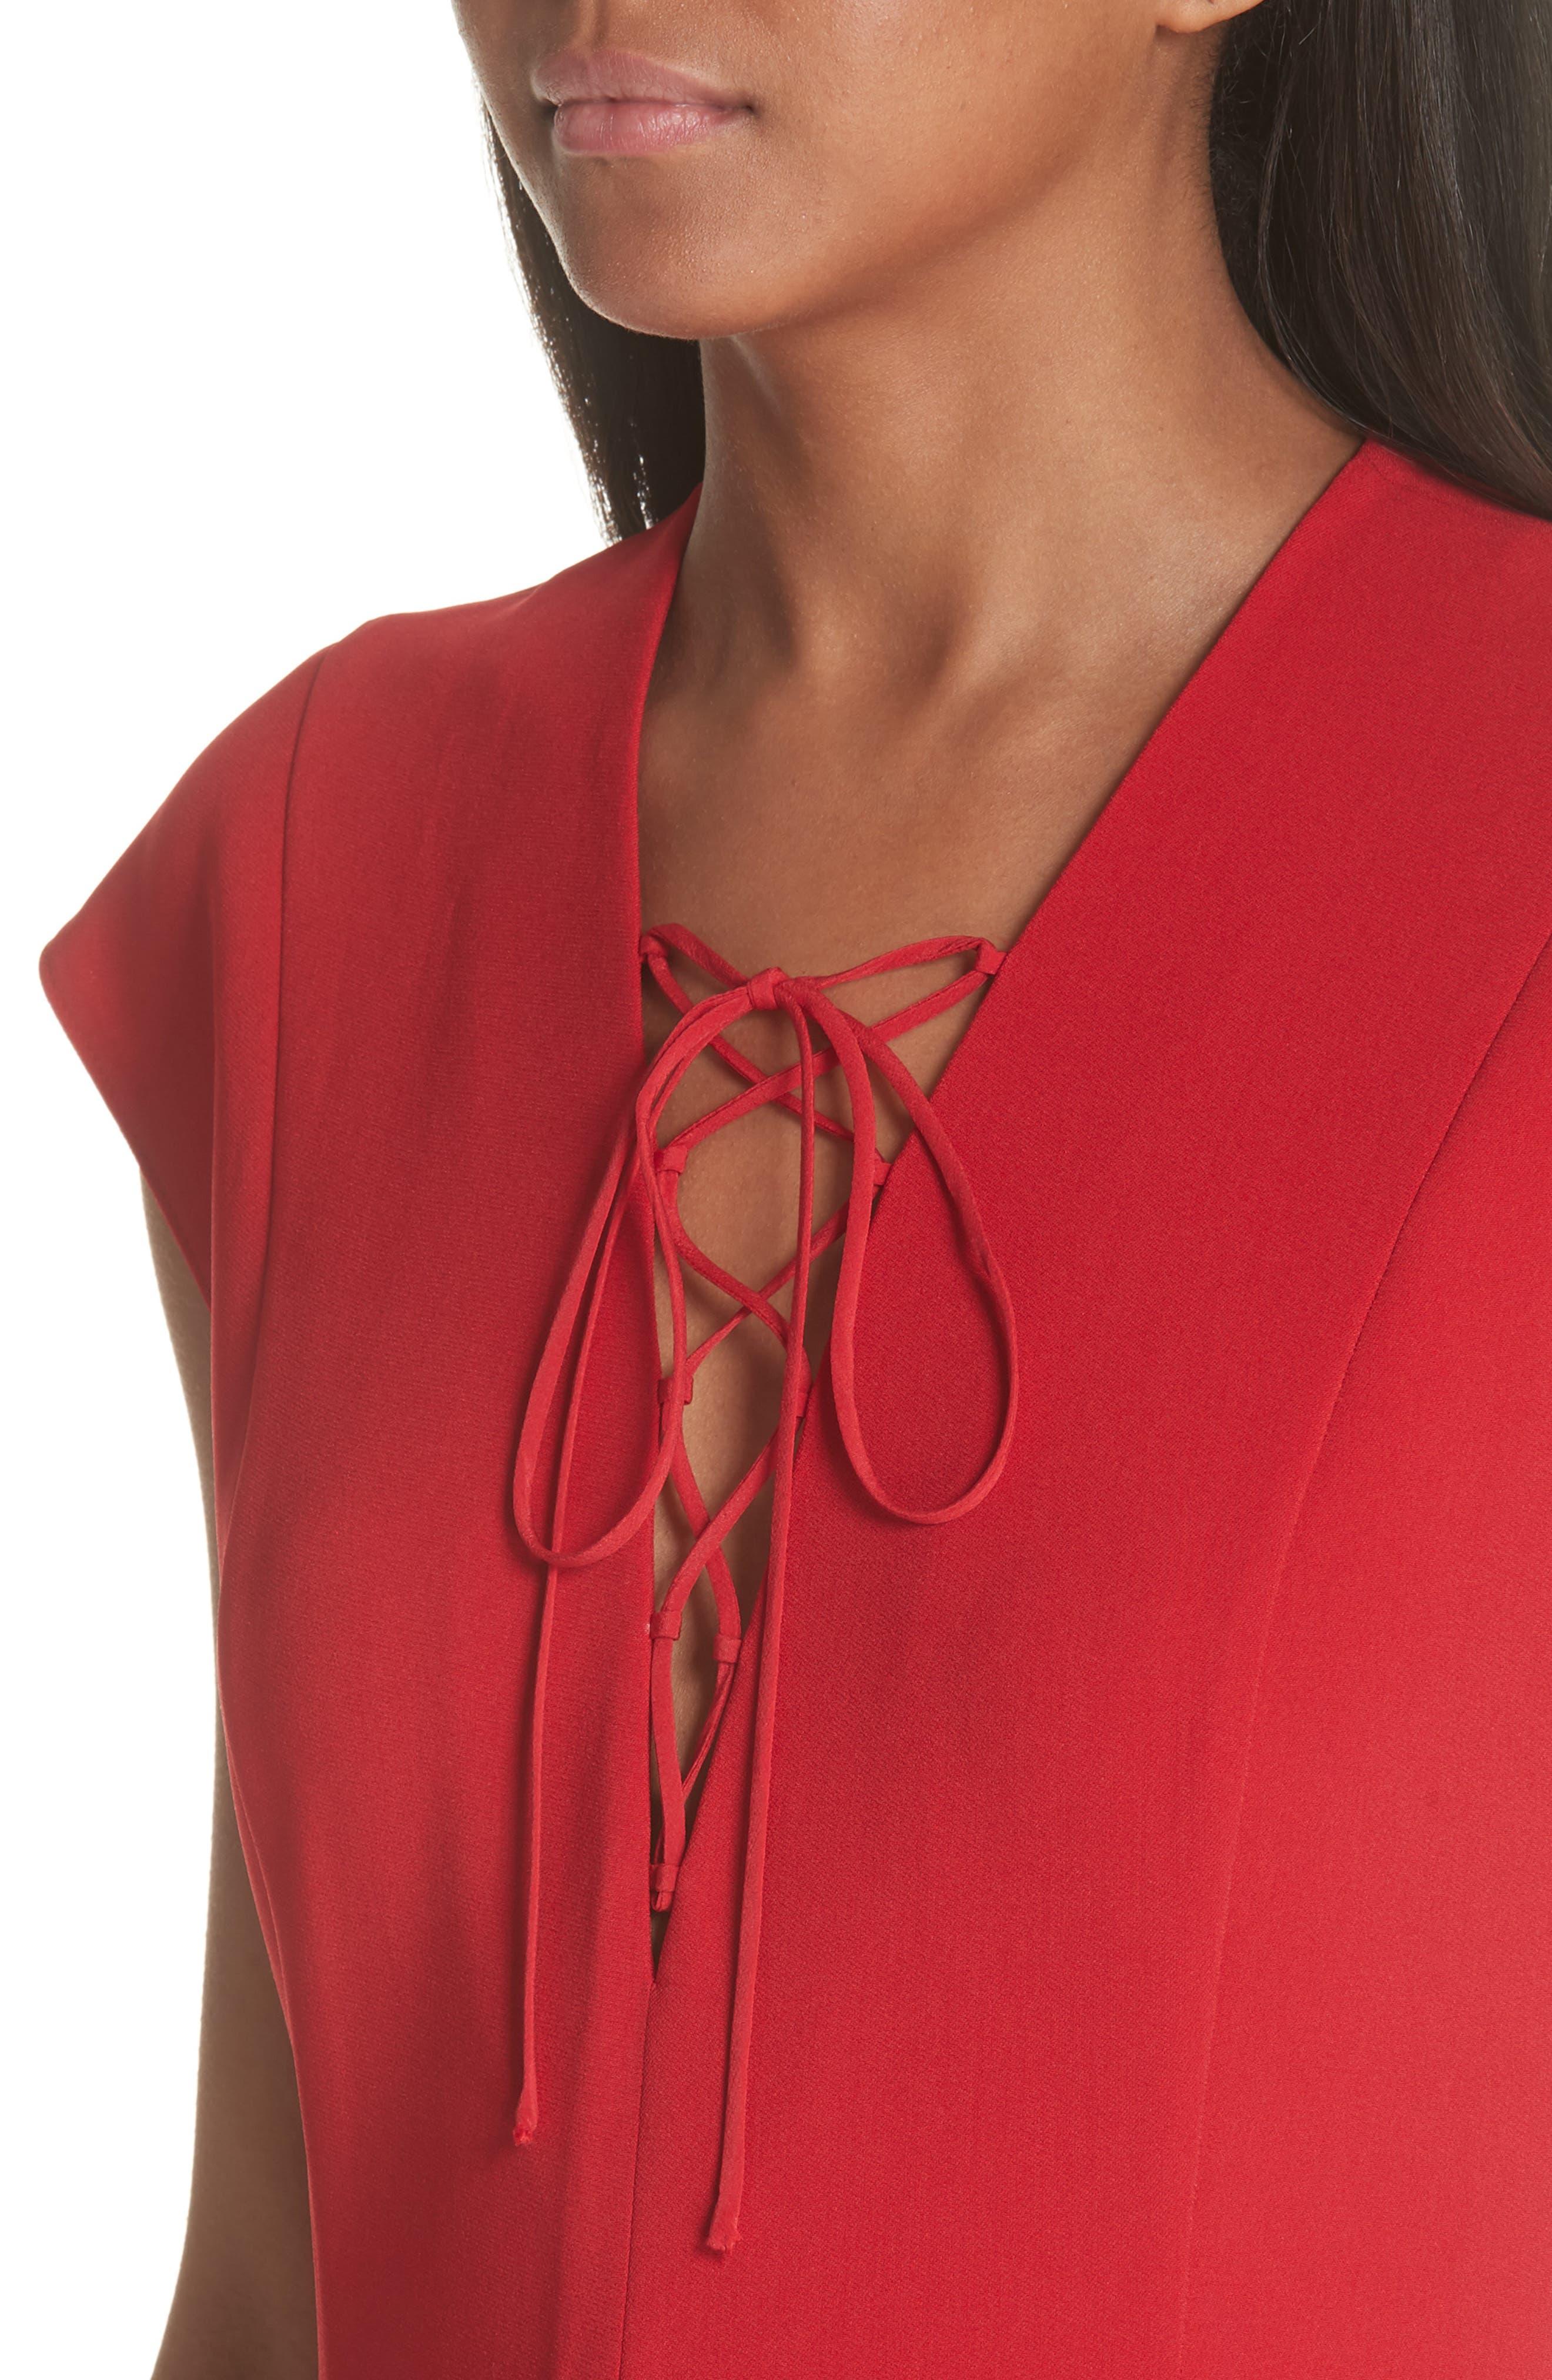 Lace-Up Dress,                             Alternate thumbnail 4, color,                             627